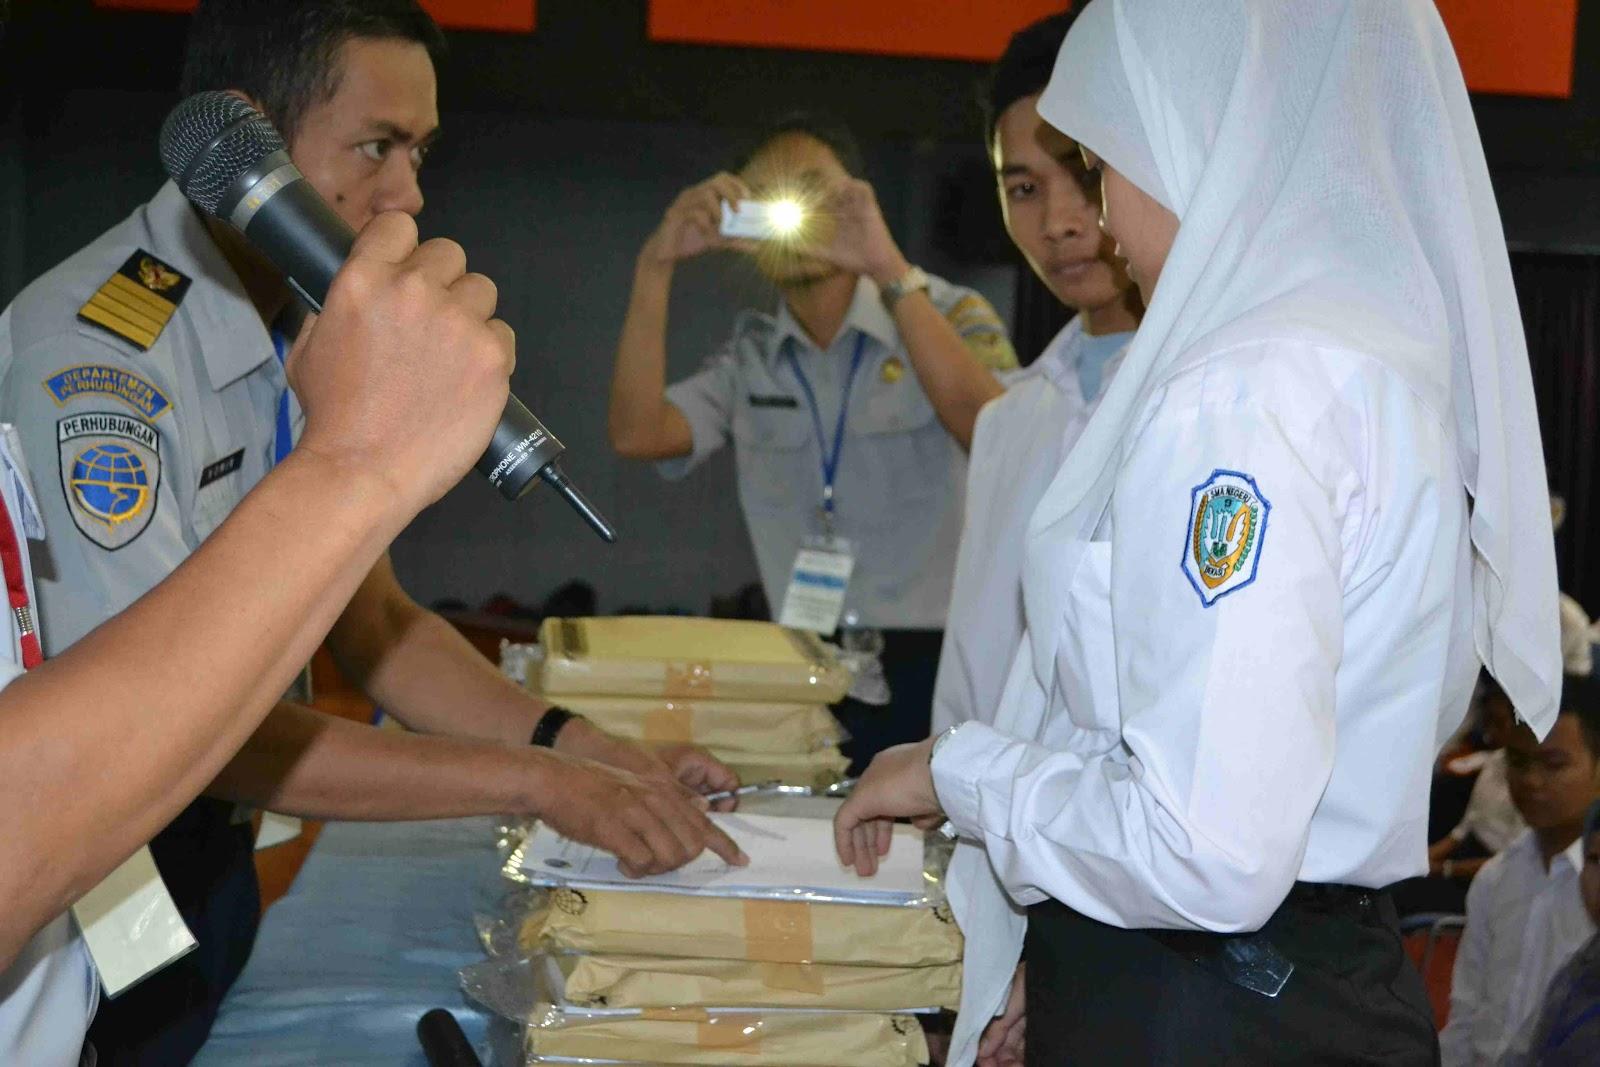 Pendaftaran Dinas Perhubungan Terbaru Kementerian Perhubungan Pusat Info Bumn Cpns 2016 Adapun Test Yang Sudah Dilaksanakan Kemarin Pada Tanggal 28 Juli 2012